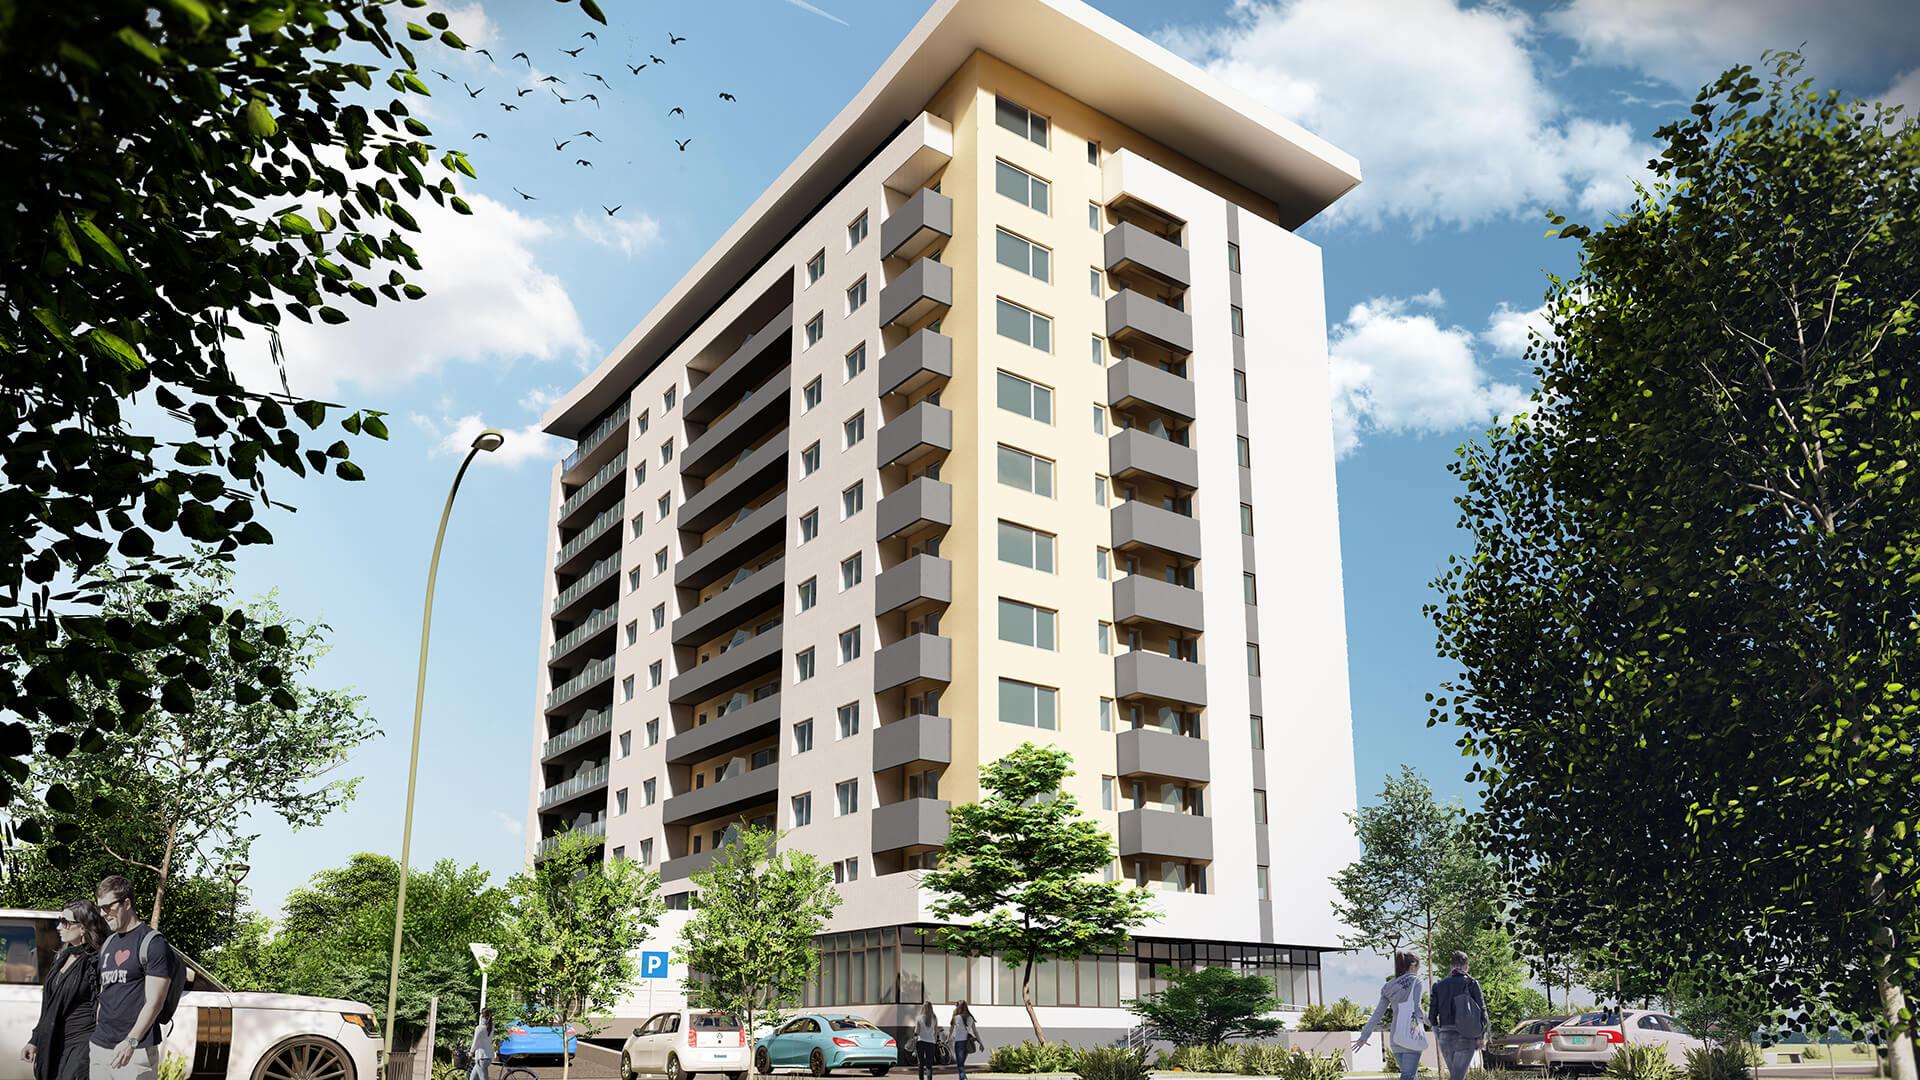 apartamente_noi_iasi_galata-nicolina_dezvoltator_cu_experienta_01